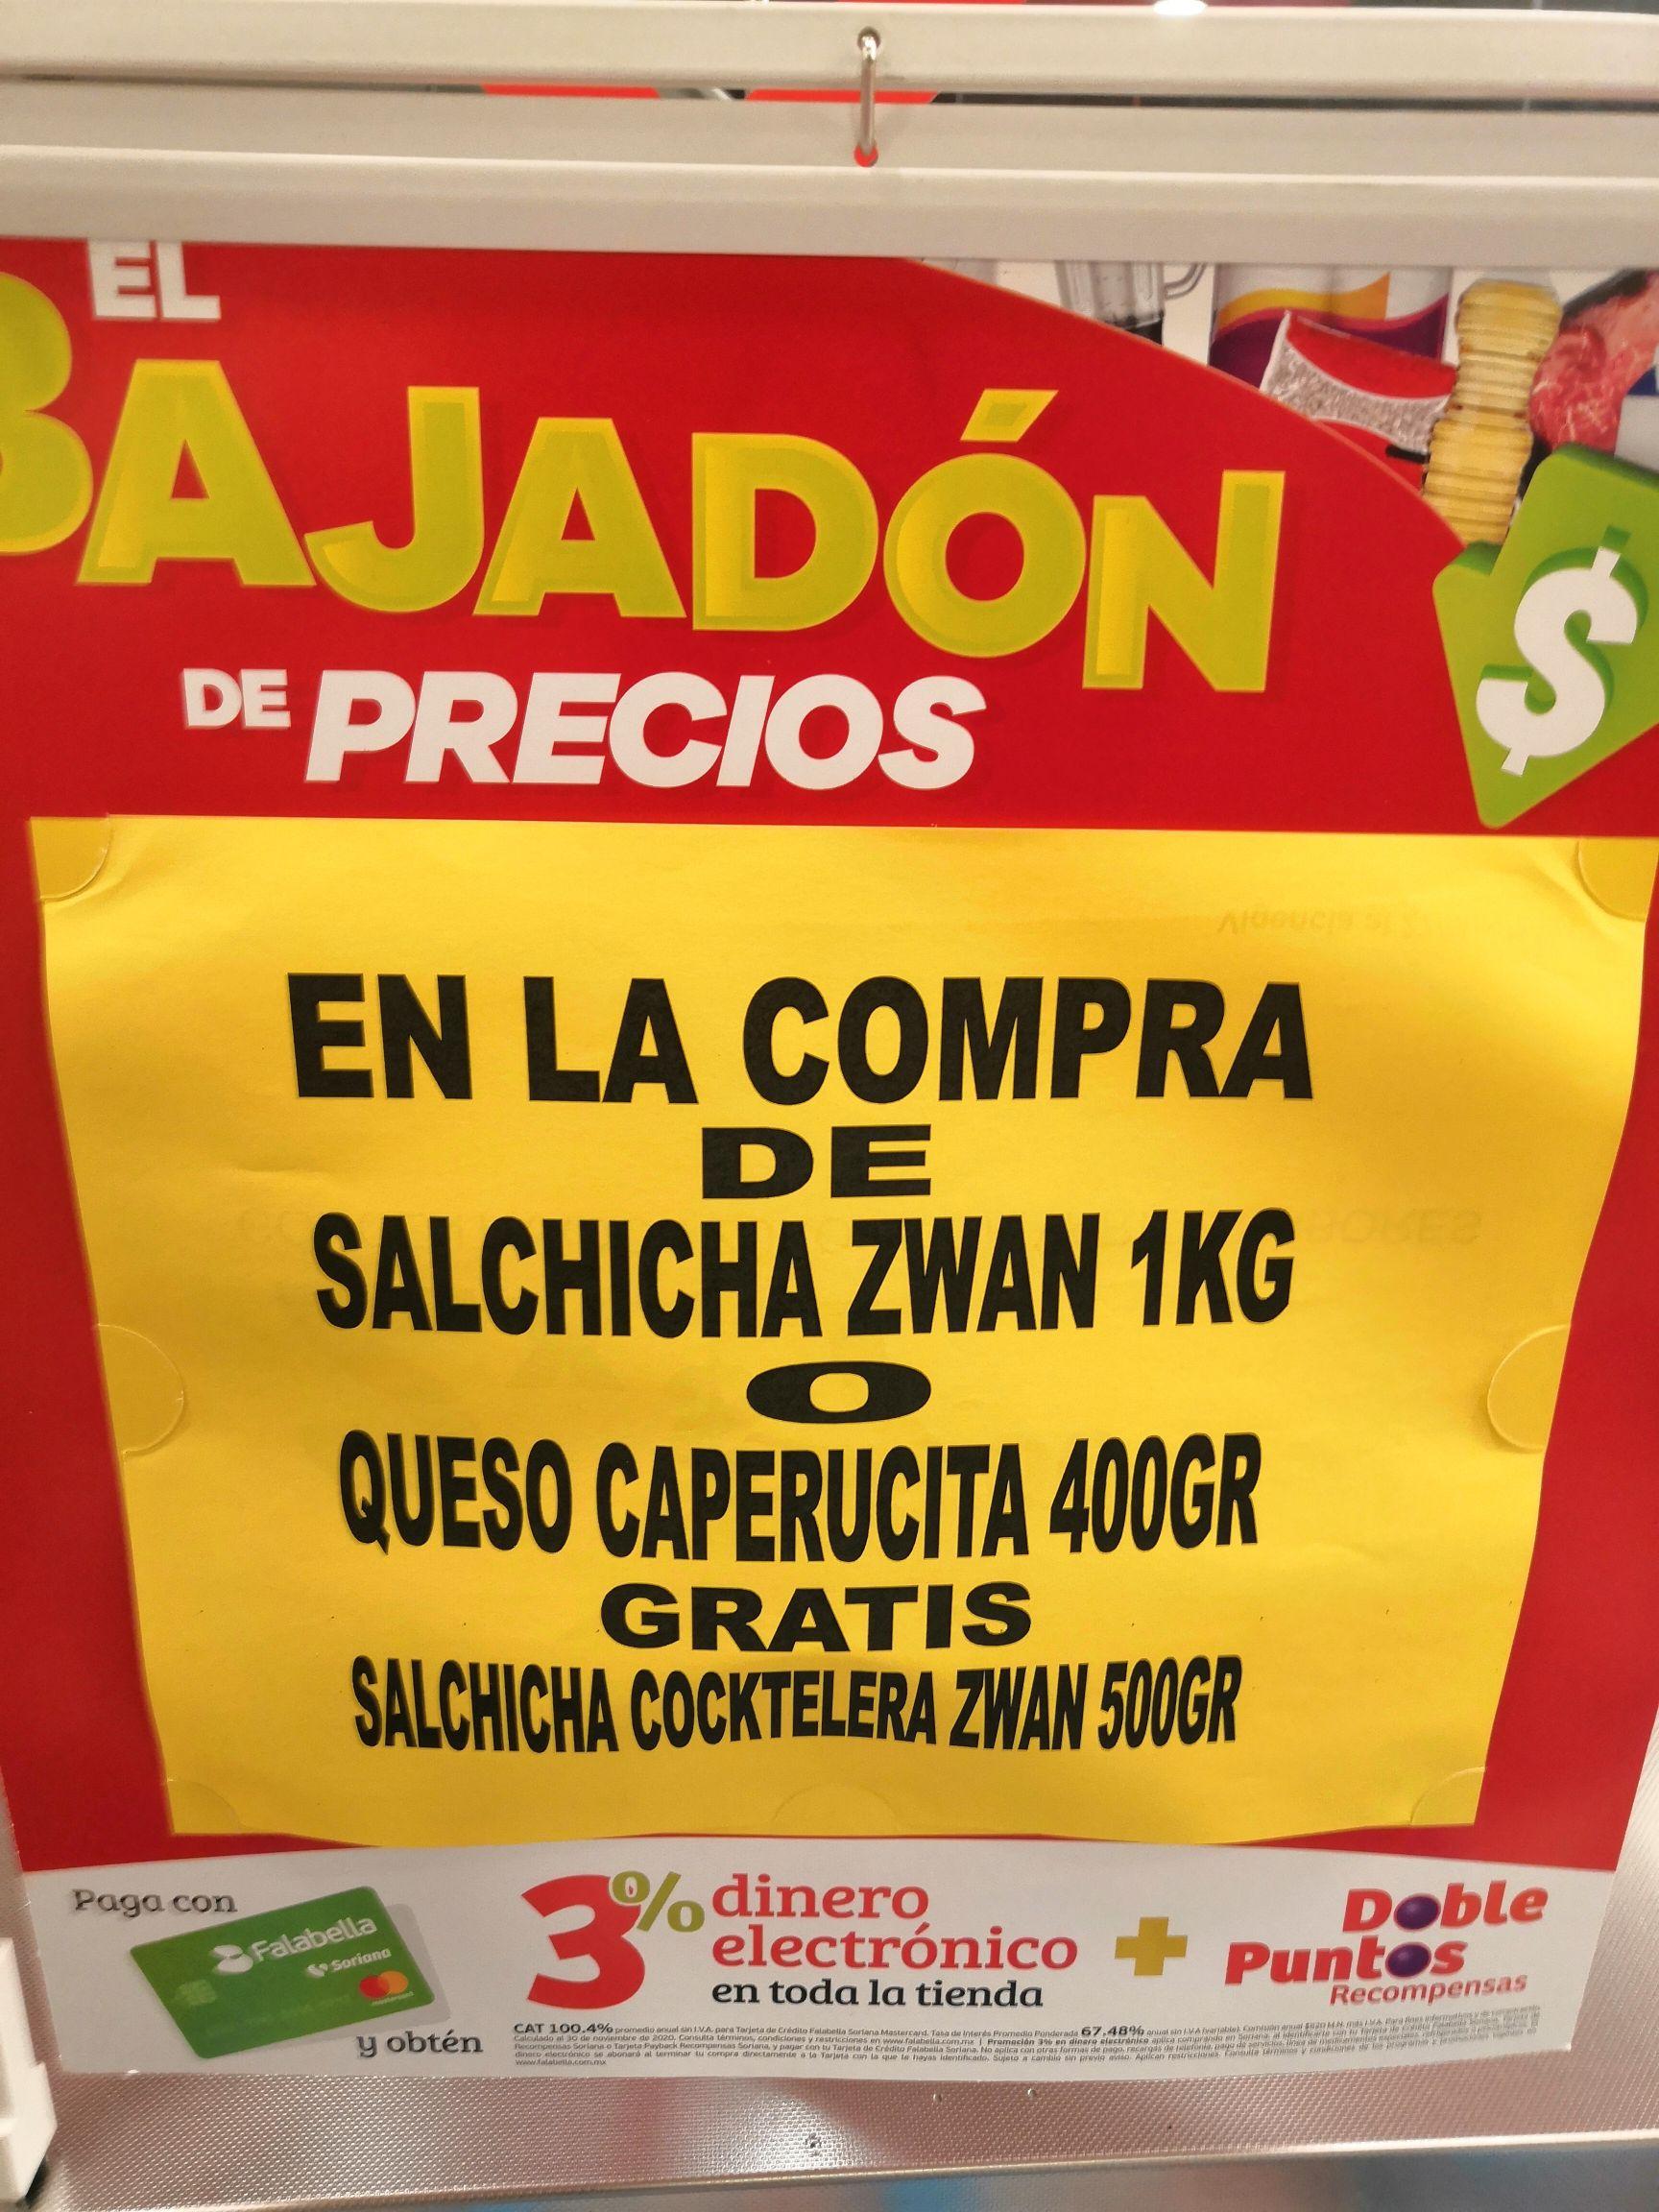 Soriana Híper Gran Terraza Coapa: En la compra de Salchicha Zwan 1 kg ó Queso Caperucita 400 g, llévate gratis Salchicha Cocktera Zwan 500 g